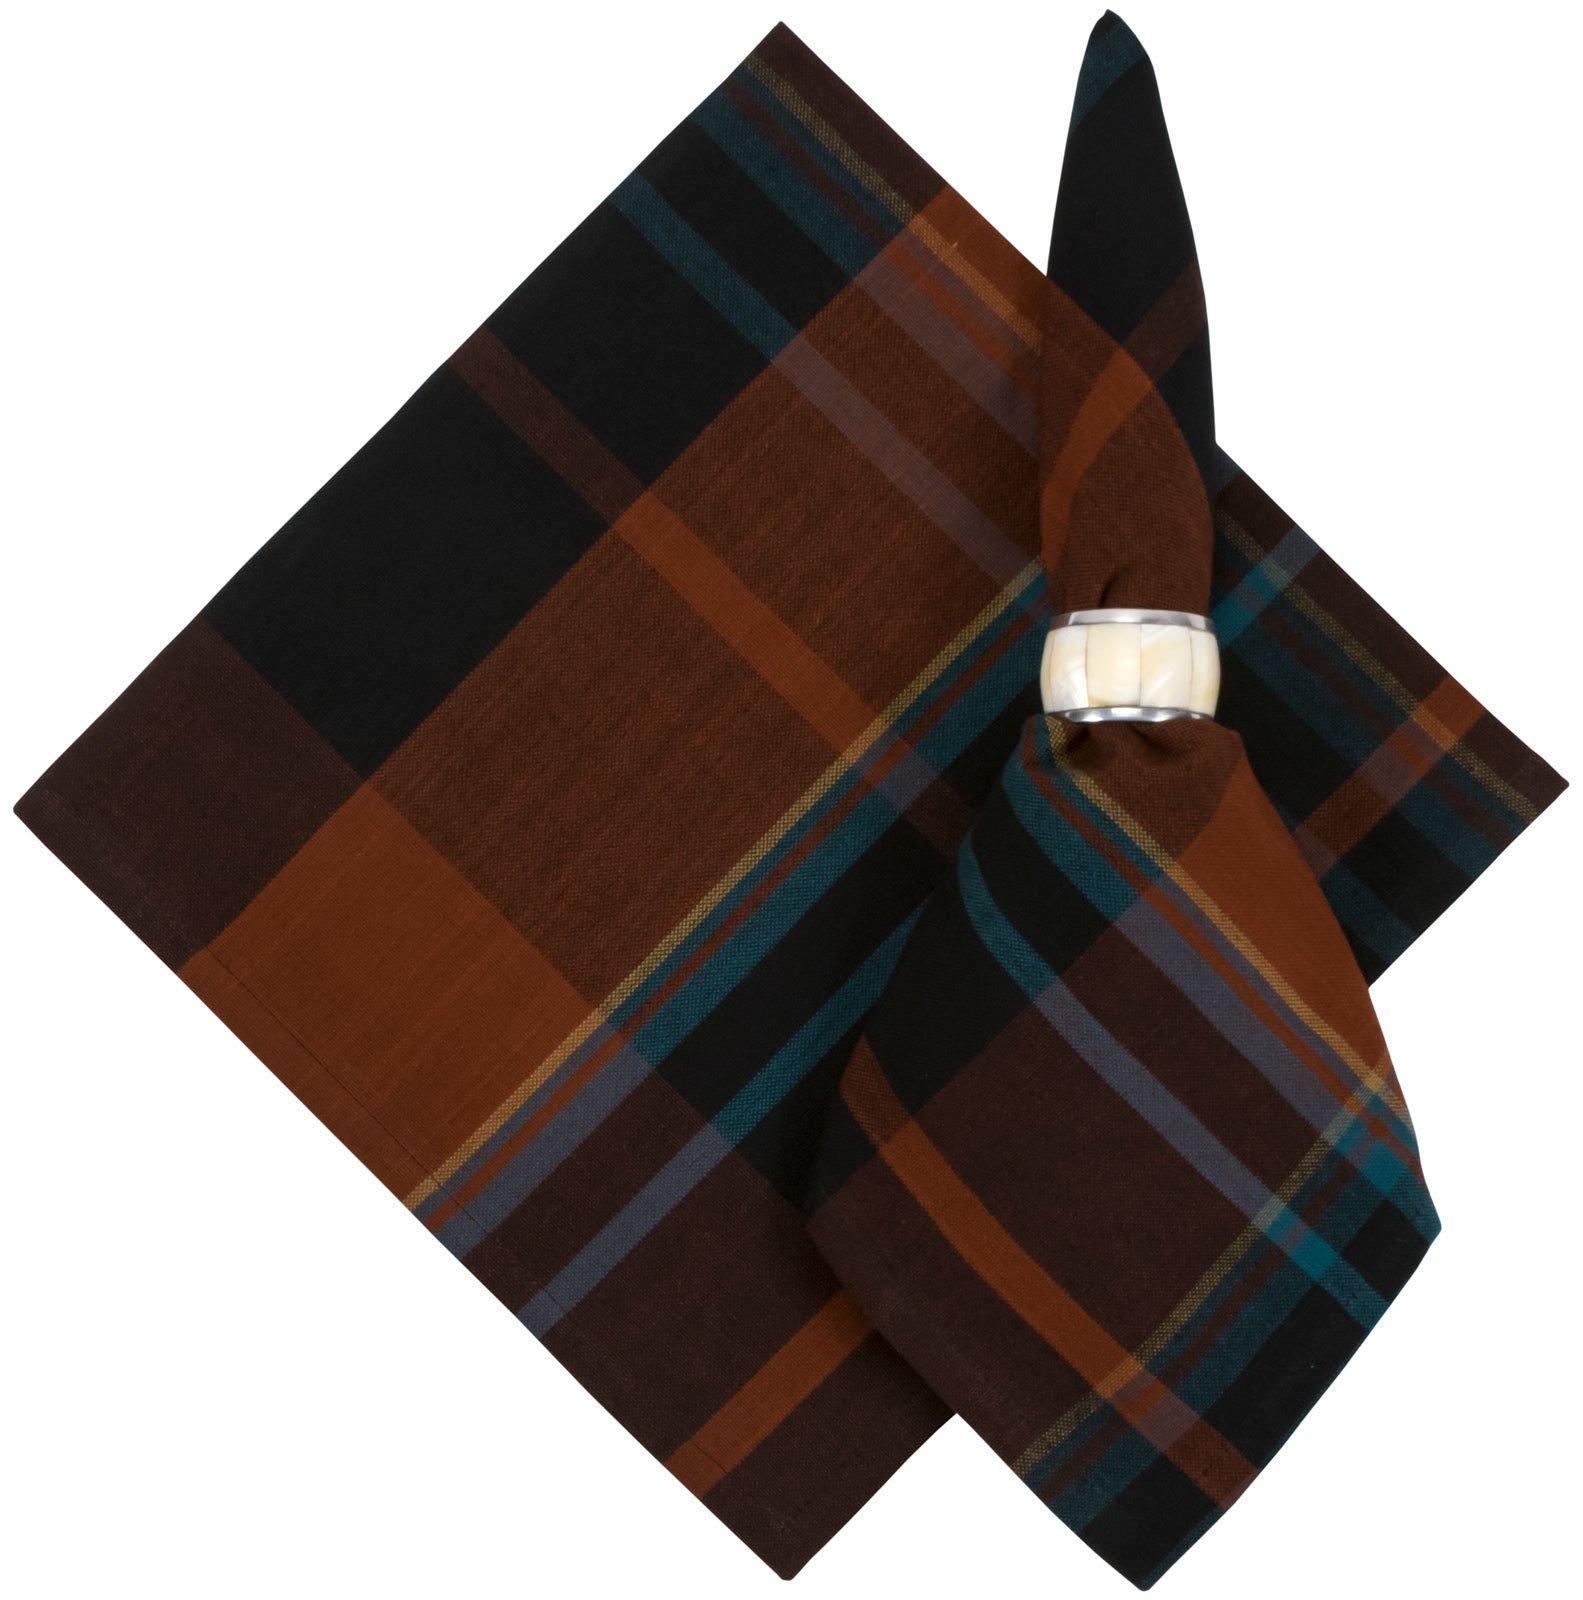 100% Cotton Brown & Navy Blue Plaid 22''x22'' Napkins, Set of 6 - Foxtail